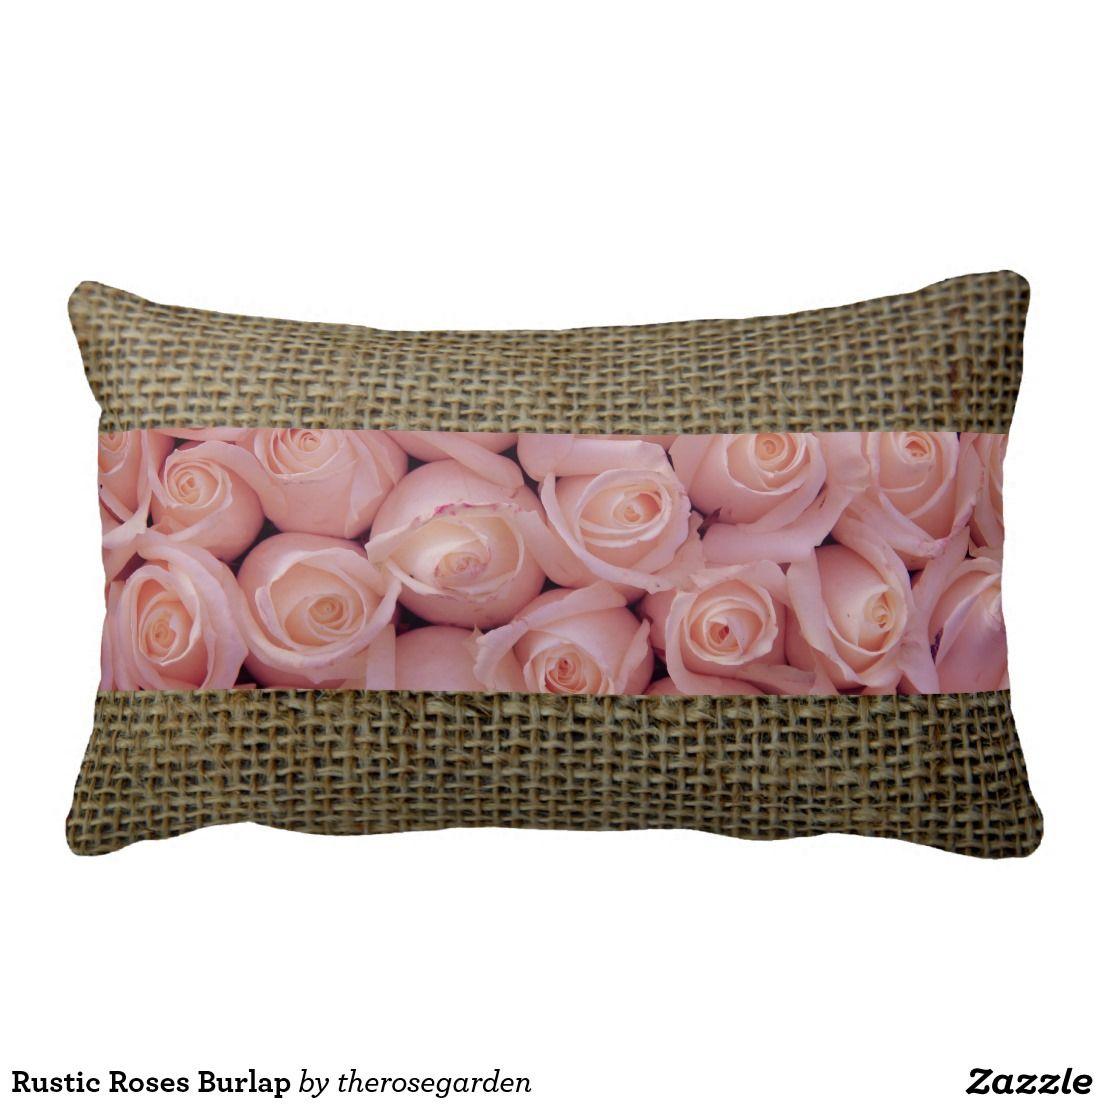 Rustic Roses Burlap Pillows